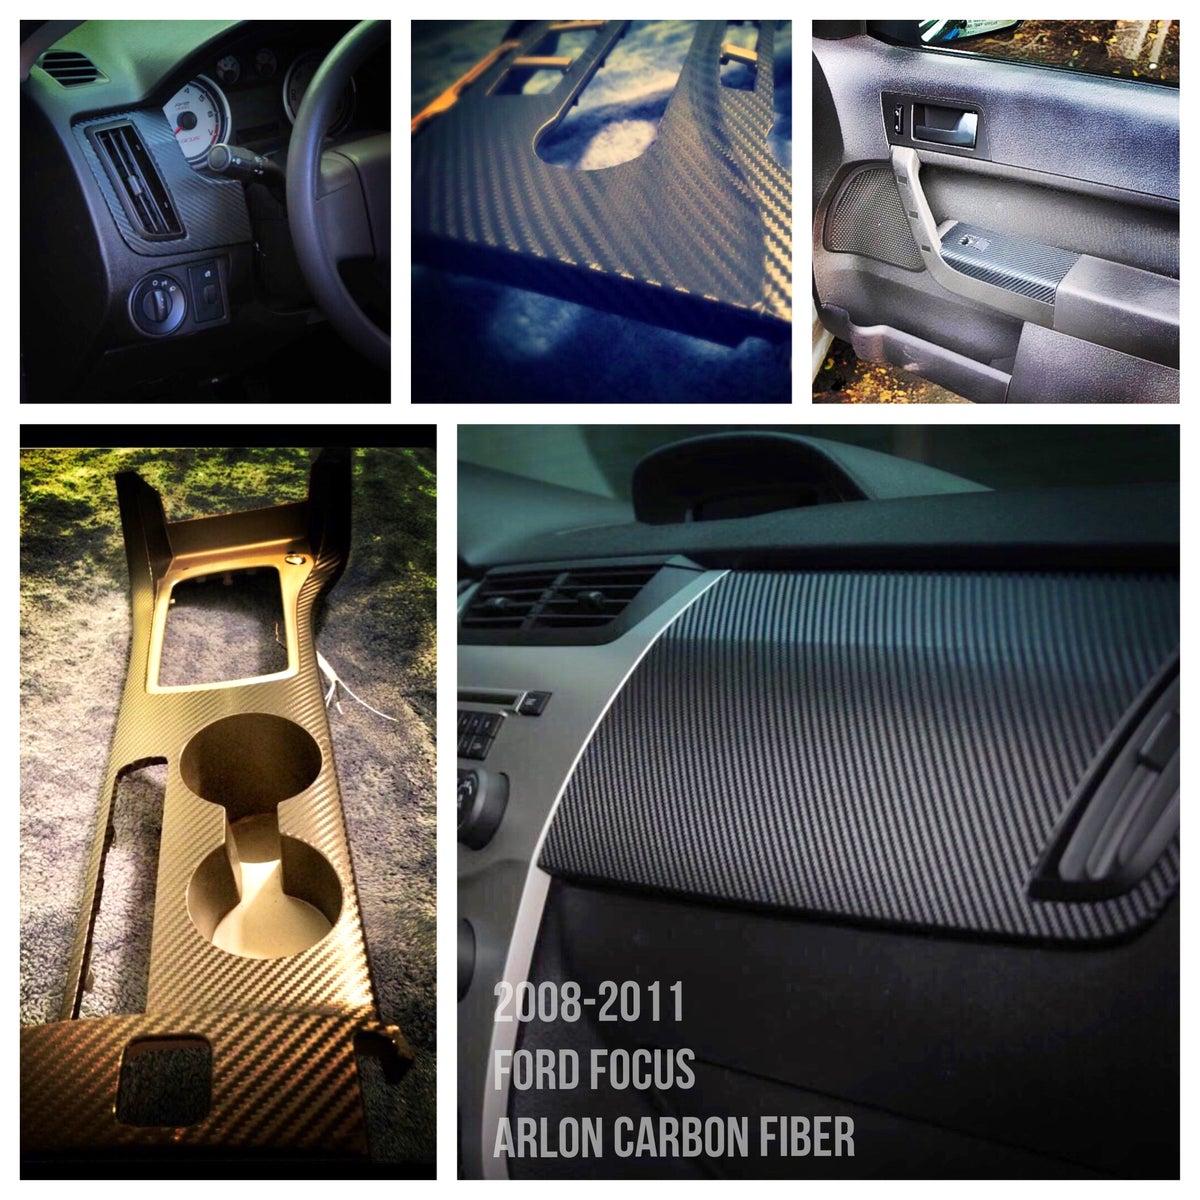 D3k Customs Ford Focus 2008 2011 Carbon Fiber Interior